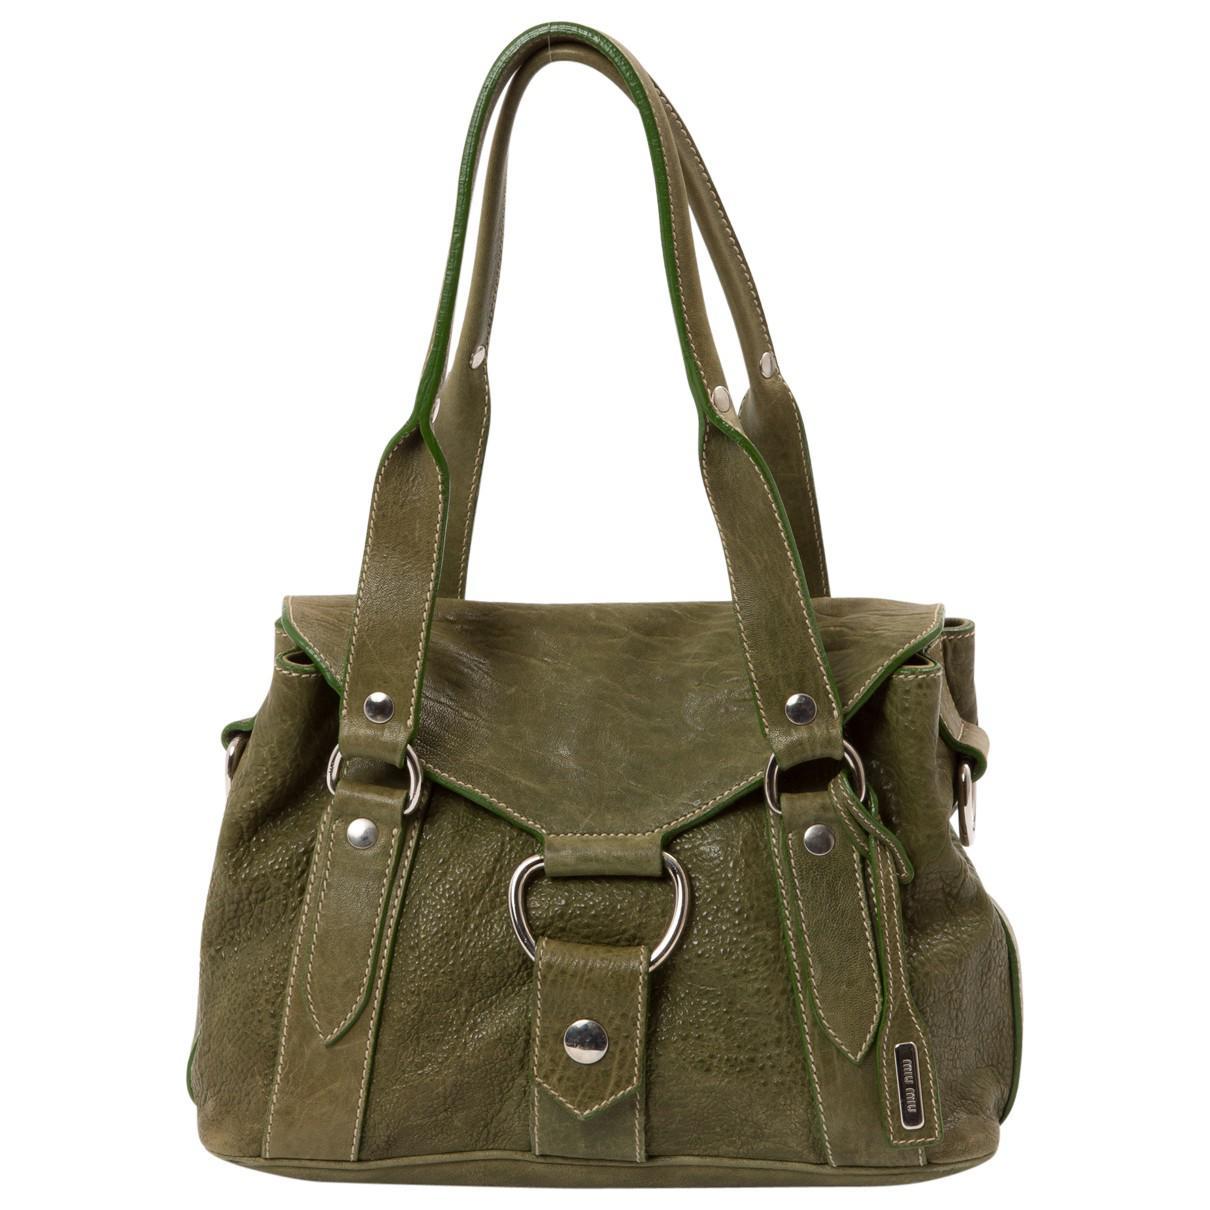 69ffd760cd8 Lyst - Miu Miu Leather Handbag in Green